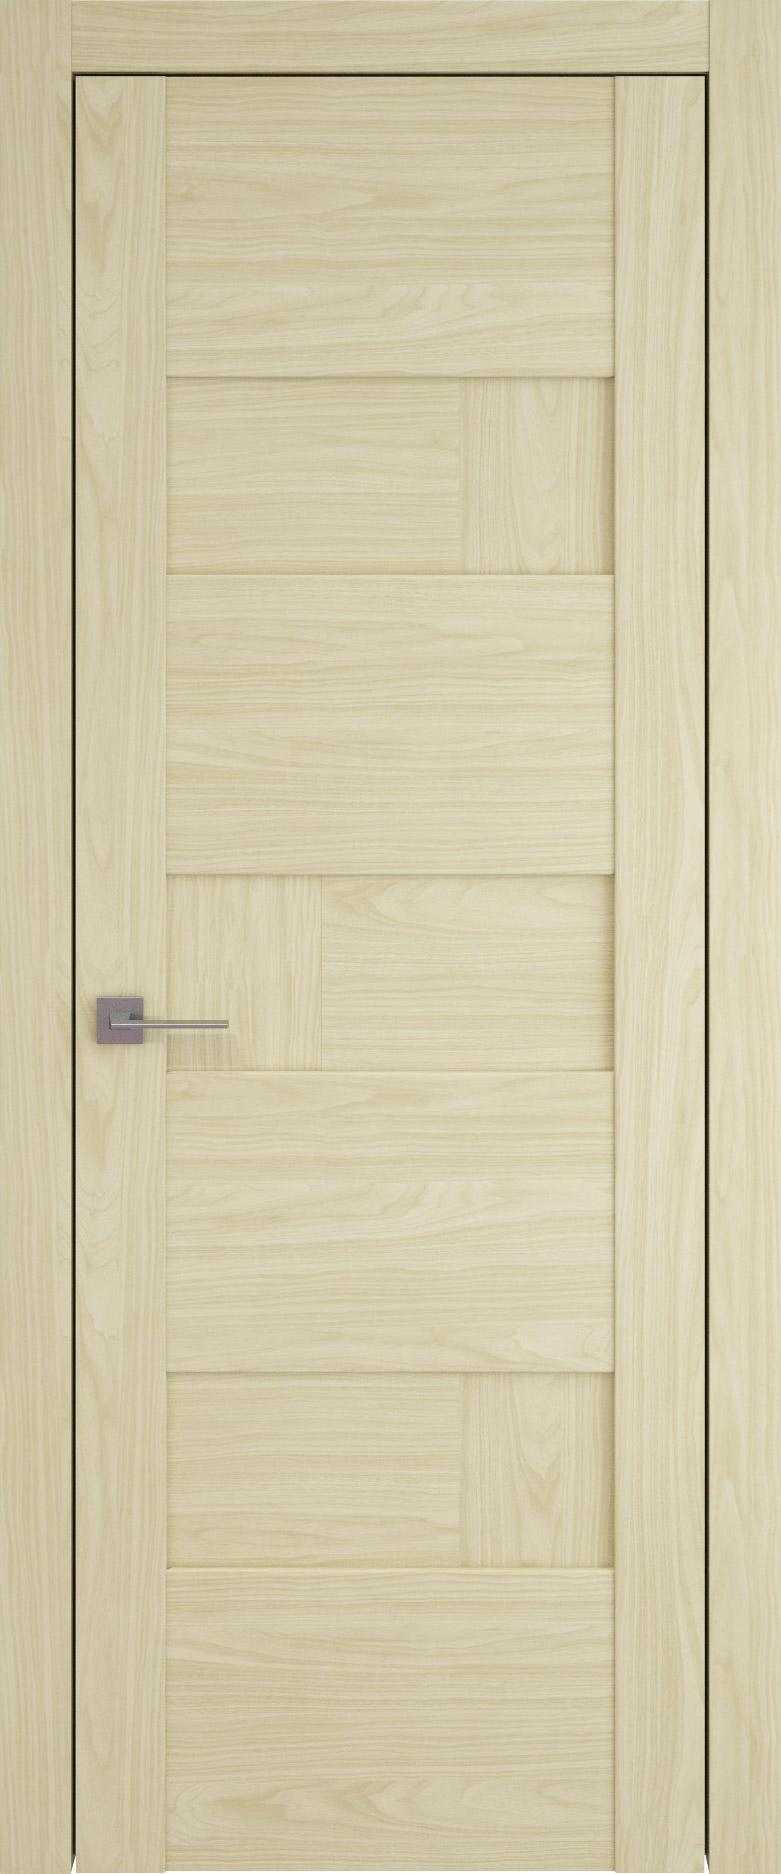 Vicenza цвет - Дуб нордик Без стекла (ДГ)